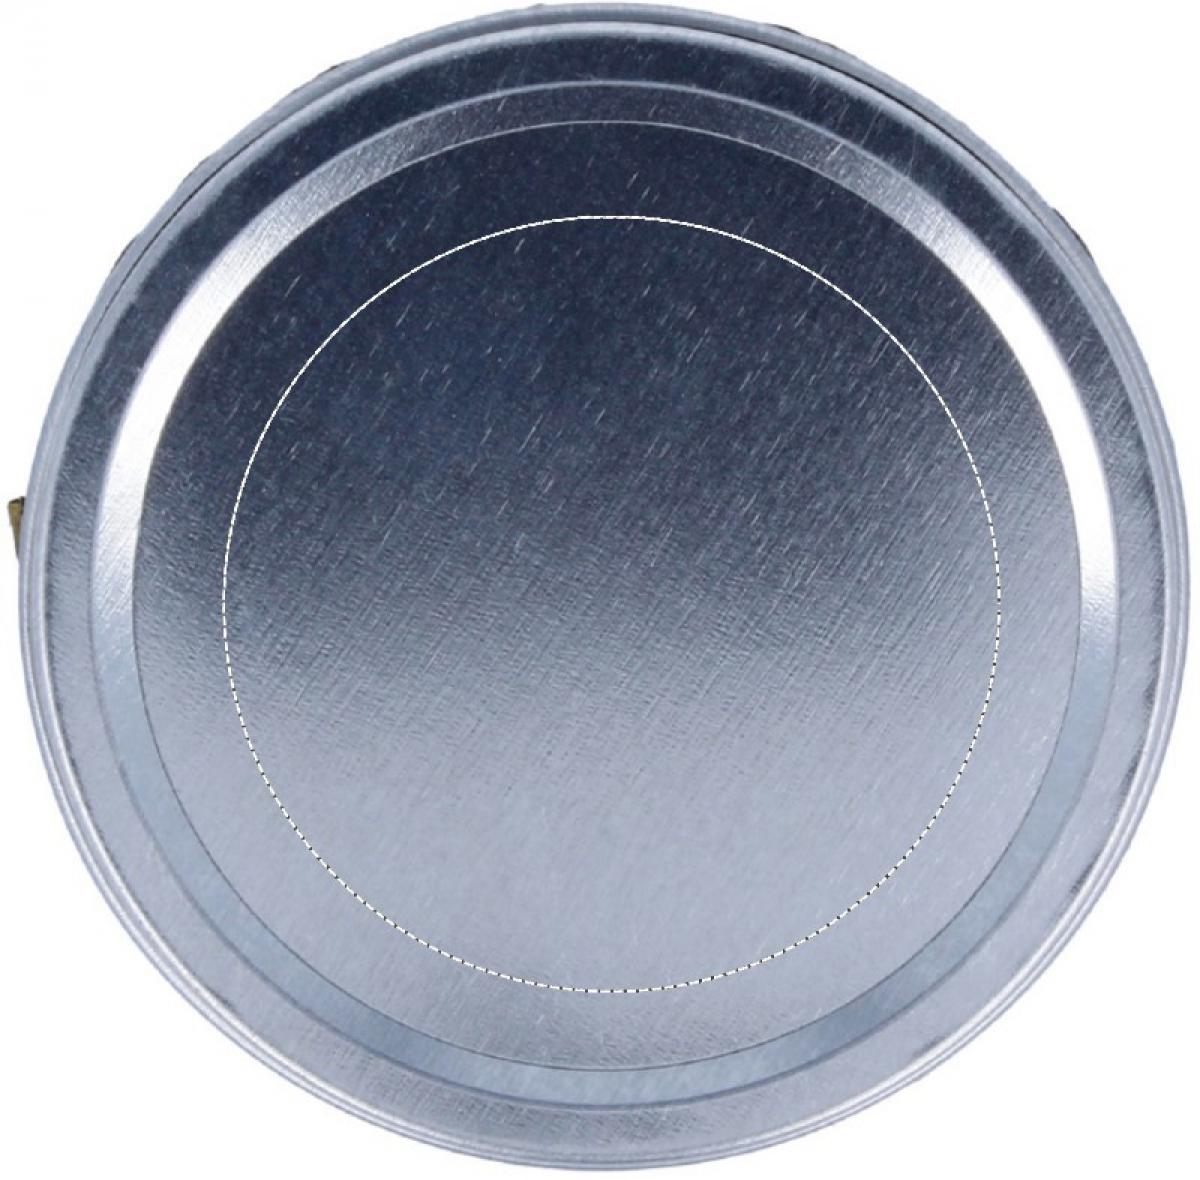 Geurkaars in blikje - Top of lid